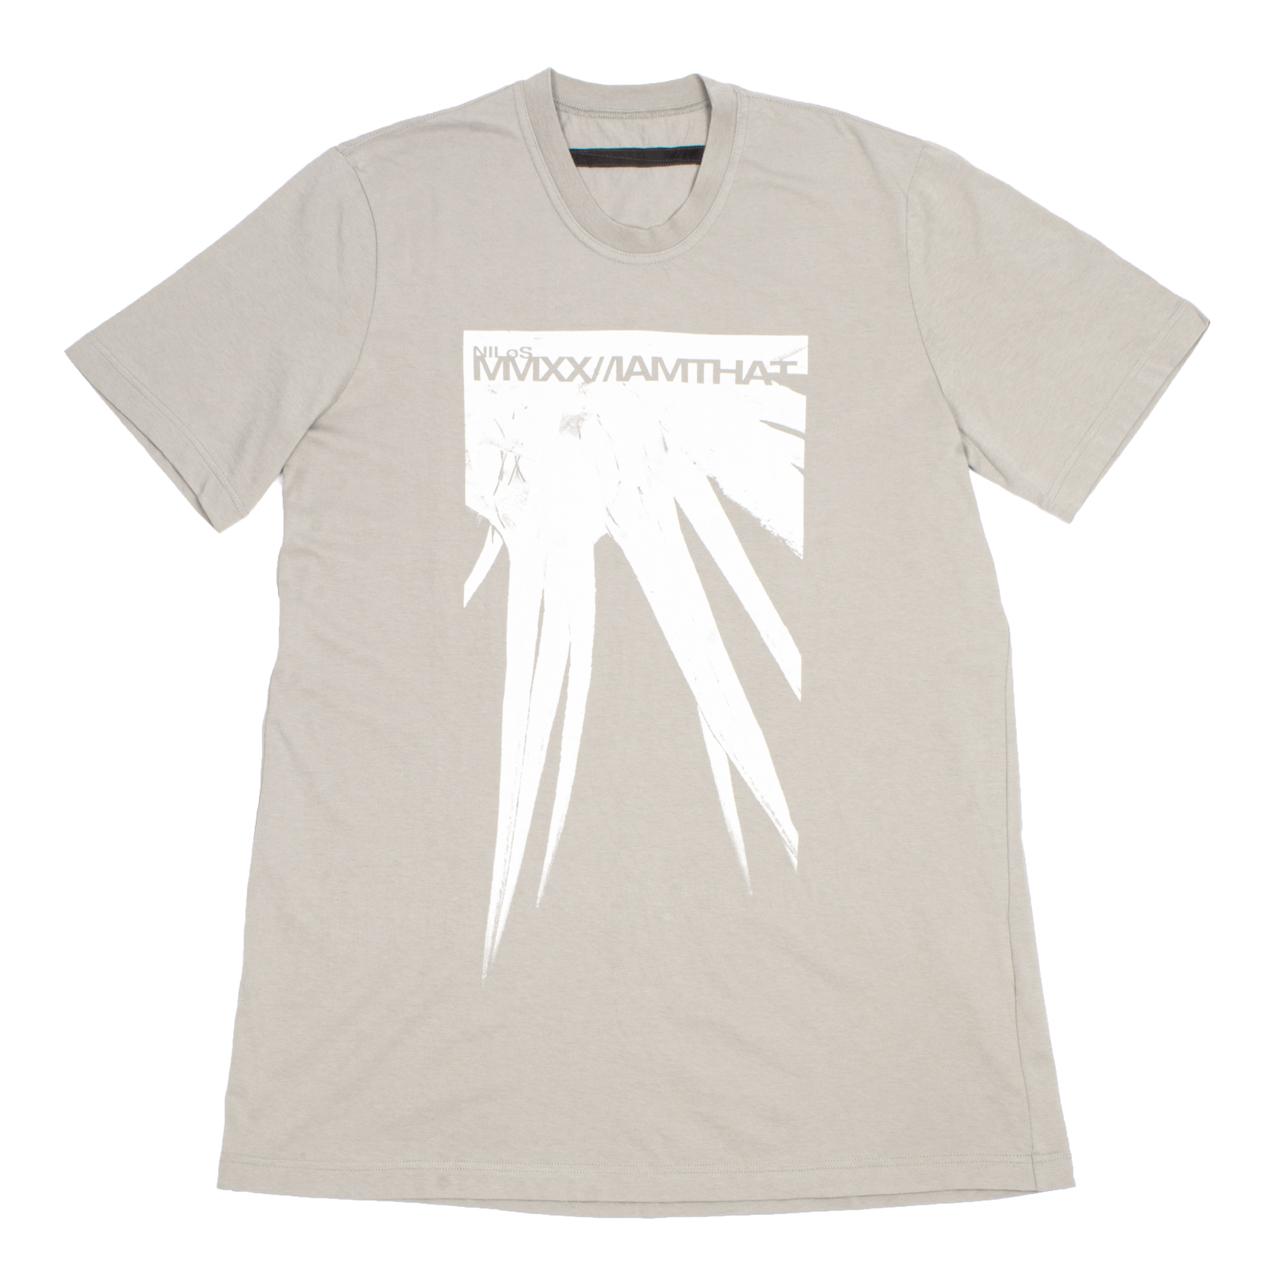 720CPM8-BEIGE / スパイク プリント Tシャツ